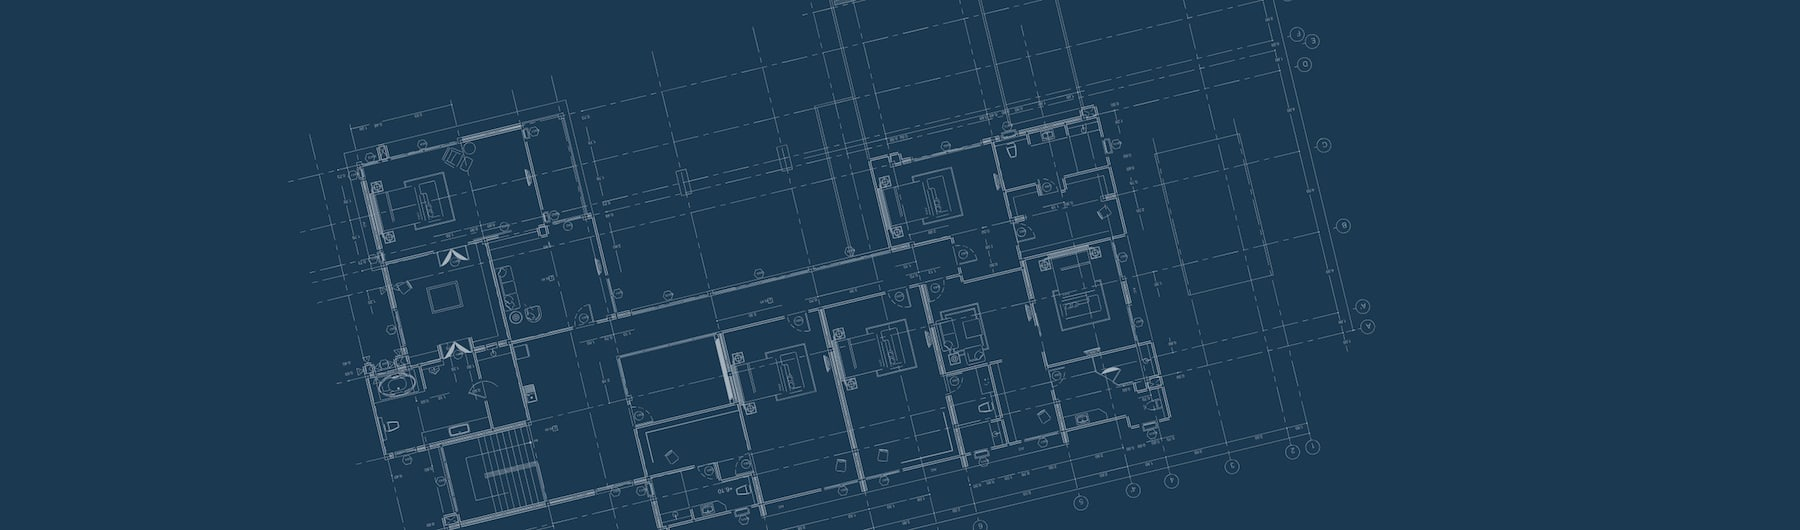 Overhead Conveyor System – Building schematics